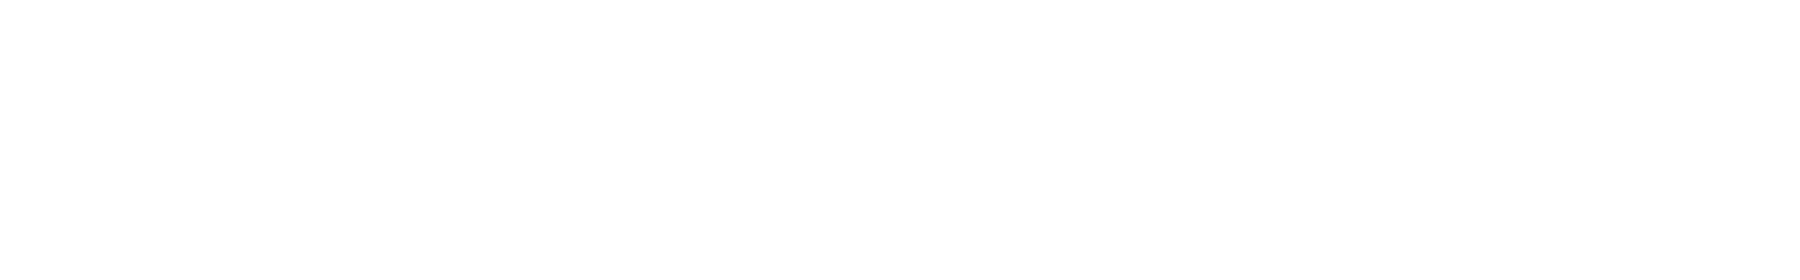 vedh melodyloop 012 bm dmaj7 a g 124bpm